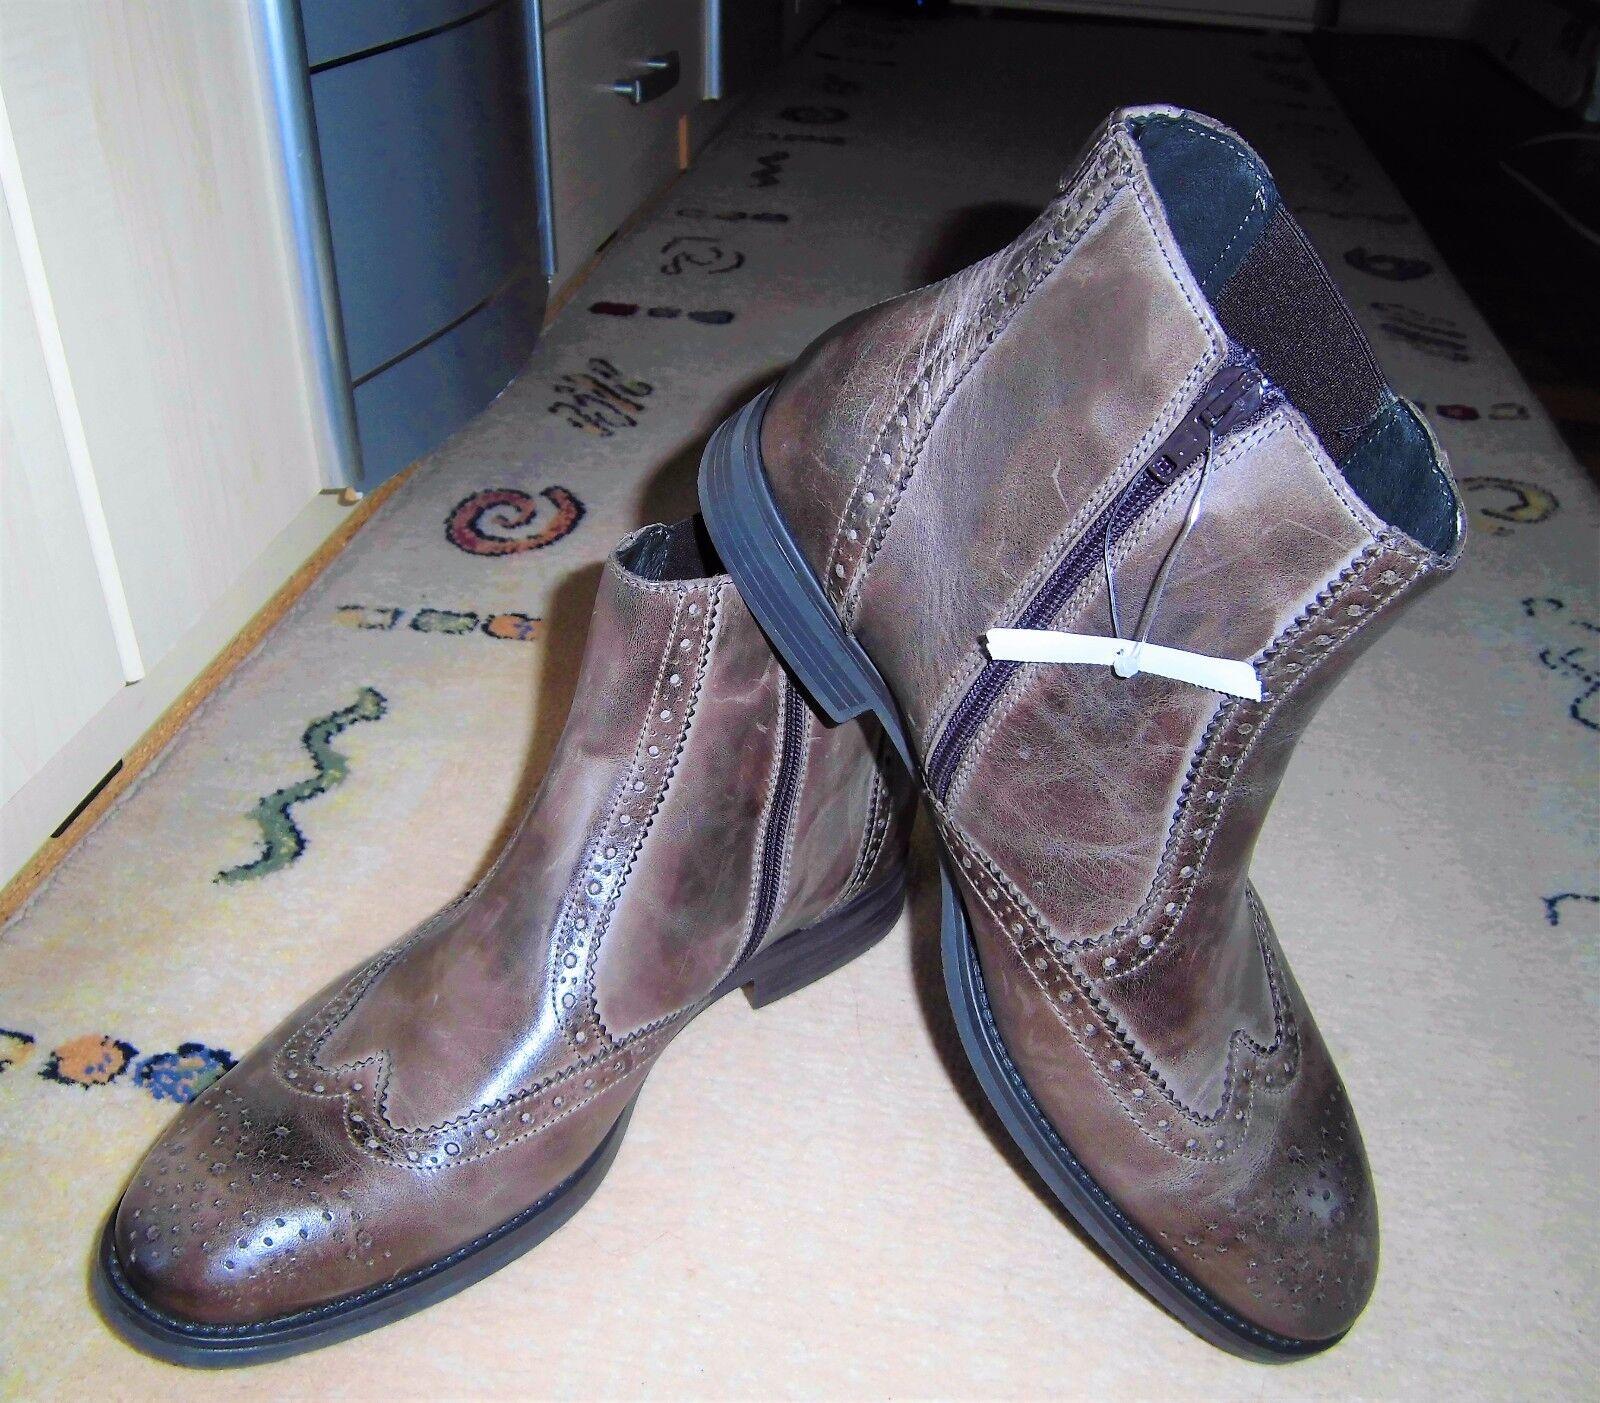 ++NEU++FRANZINI Lavorazione Artigiana Chelsea Boots ++Gr. 43++braun++Echtleder++